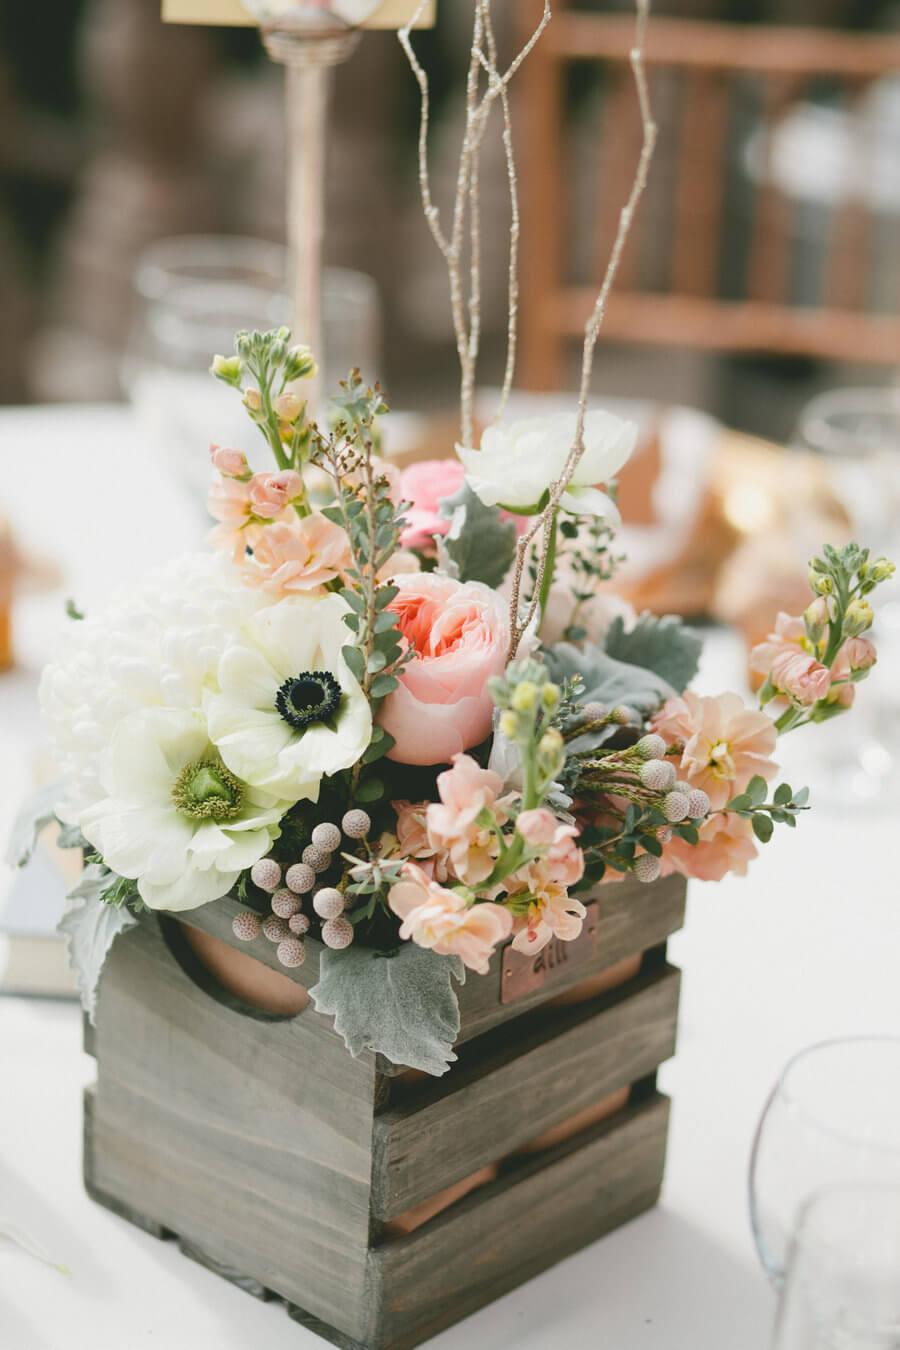 A Feminine Box with a Delicate Floral Arrangement